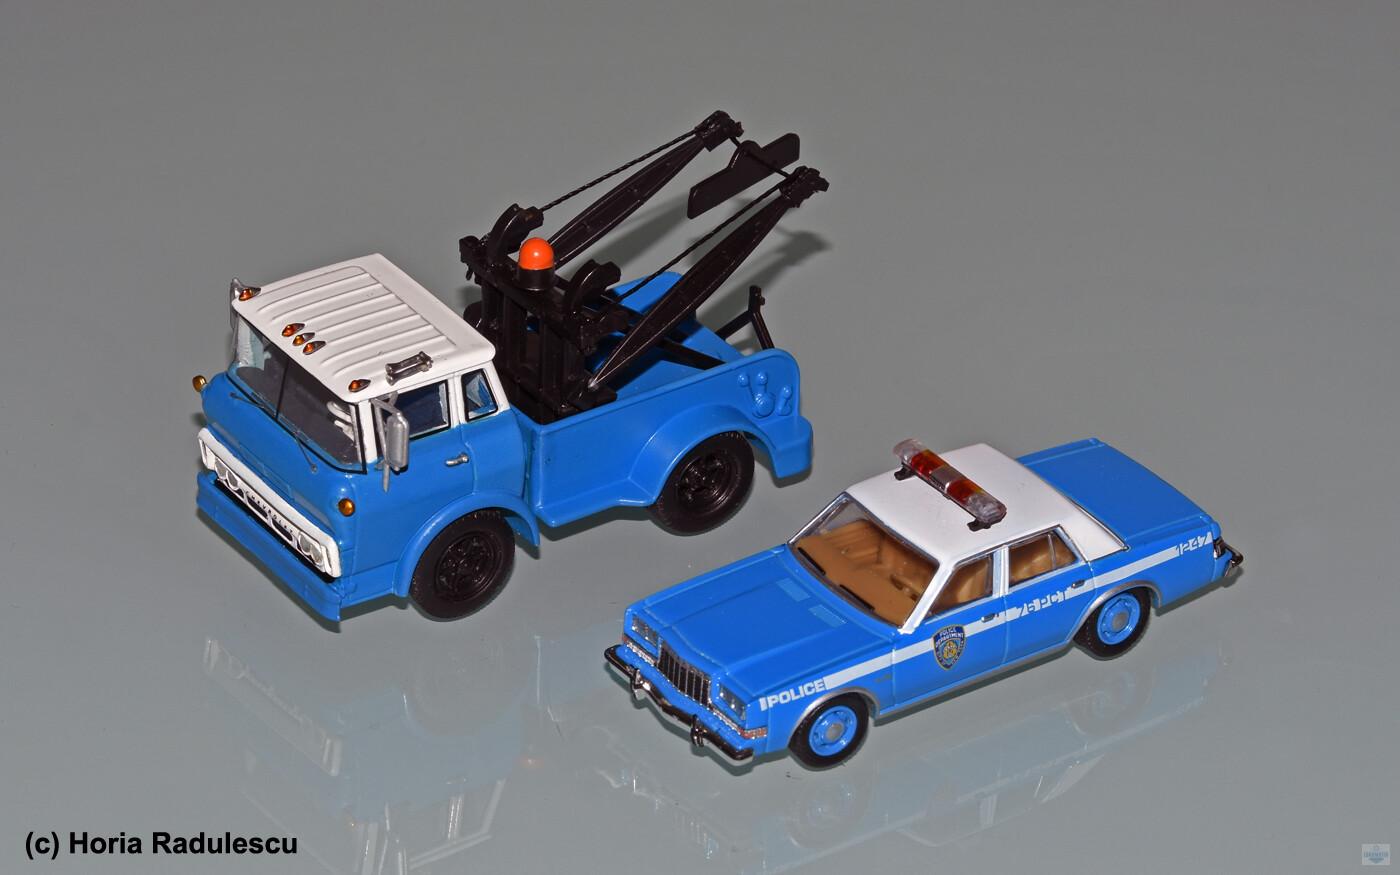 64-NYPD-MTD-Chevrolet-Umbau-HR-mit-RMP-Gran-Fury.jpg